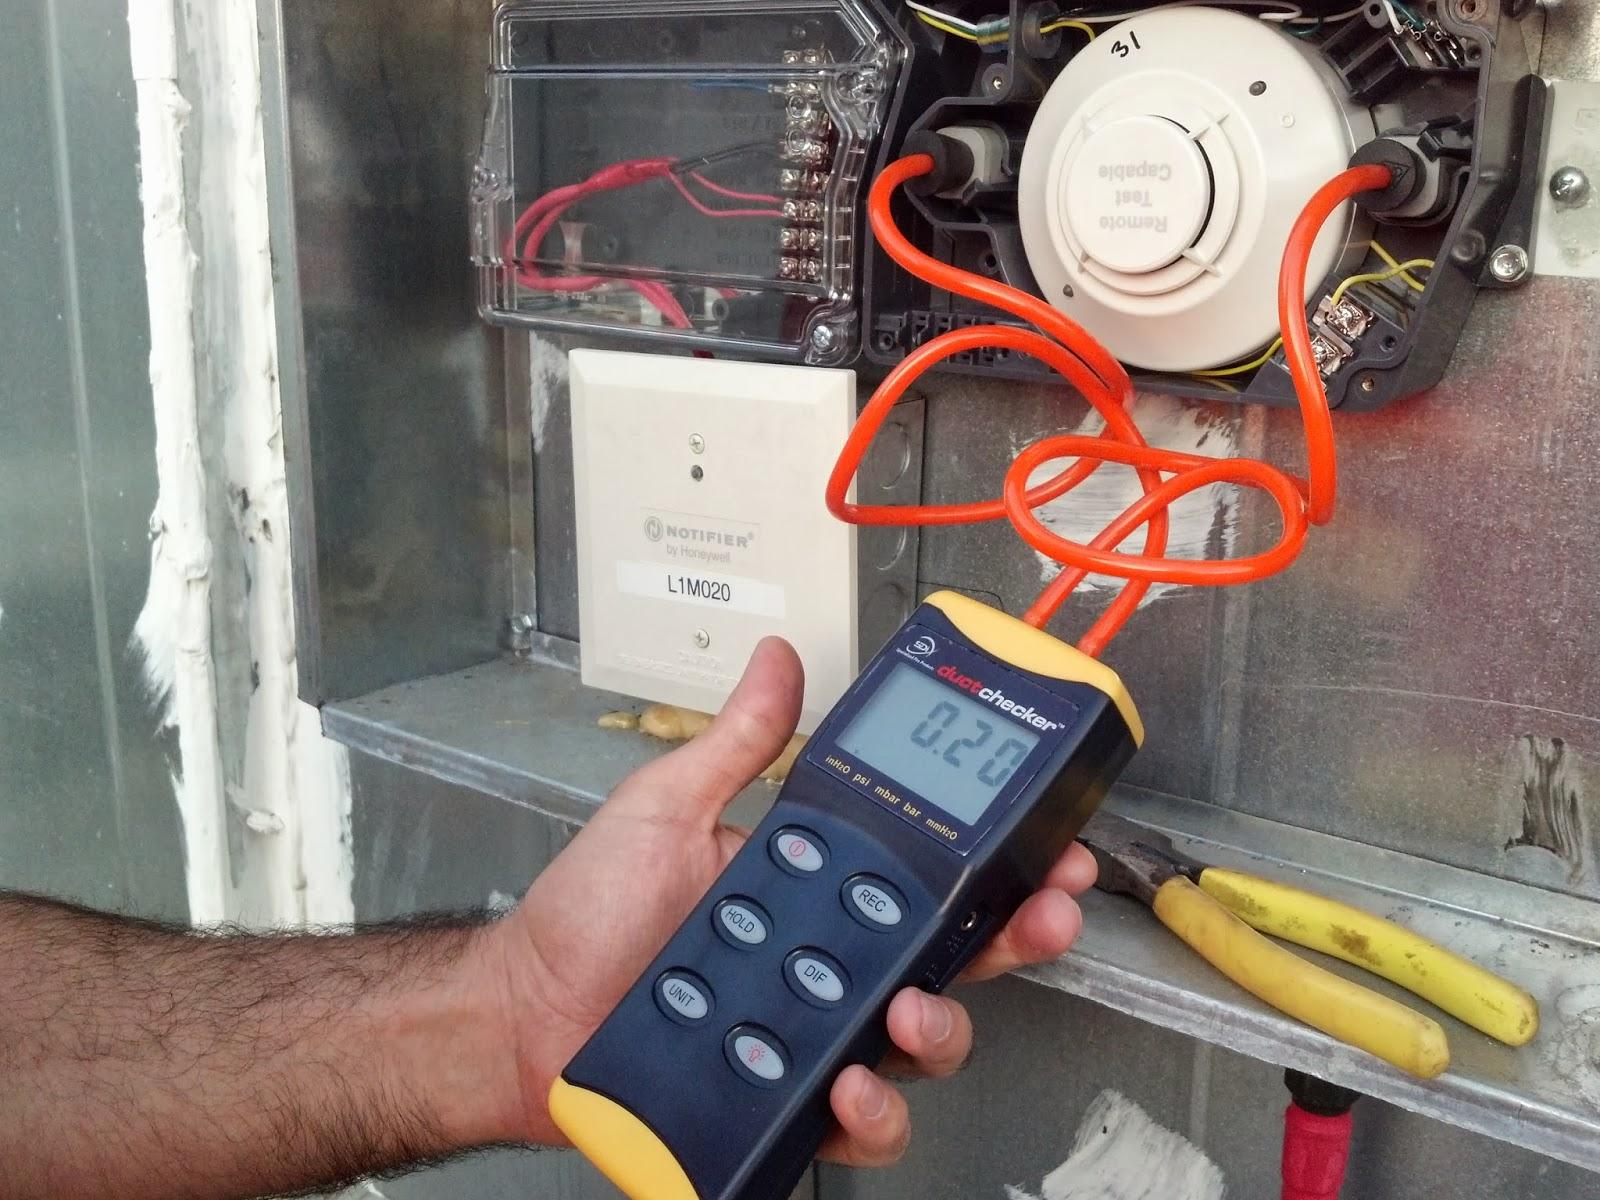 notifier duct detector wiring diagram john deere stx38 lawn tractor using a manometer on system sensor d4120 fire alarms online testing smoke